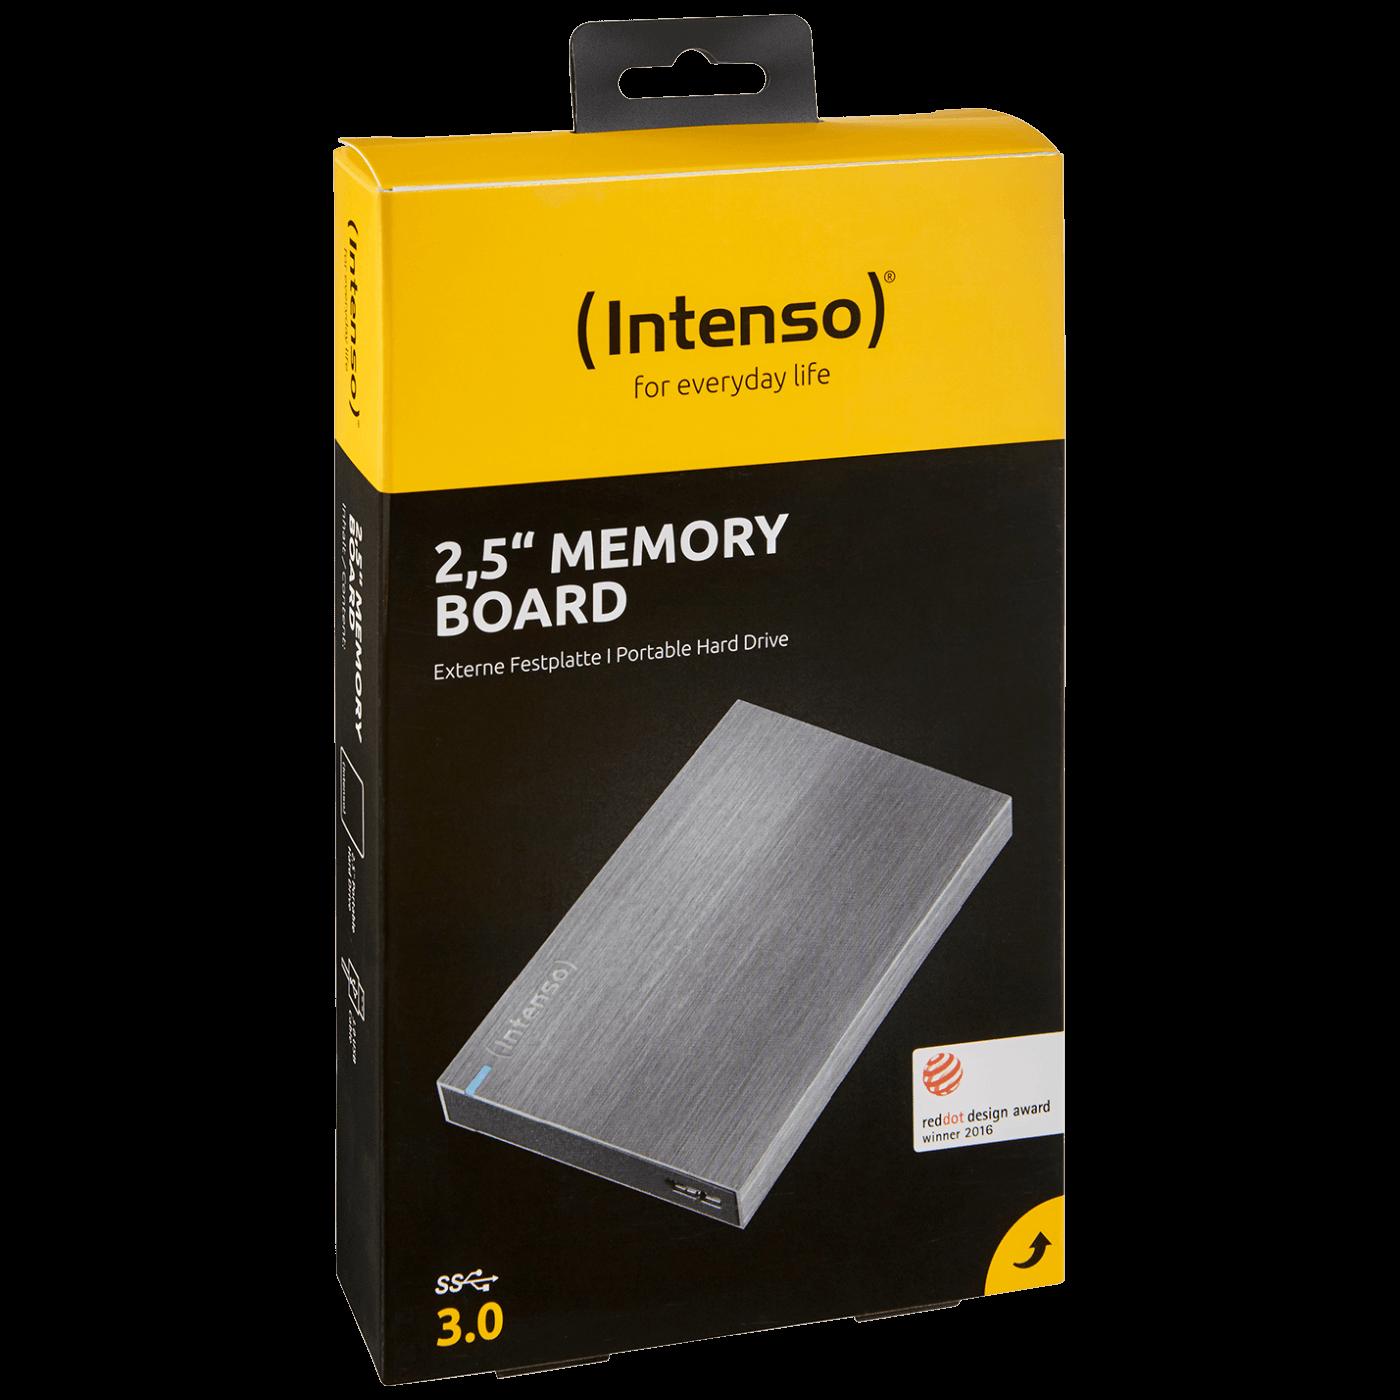 HDD3.0-1TB/Memory Board